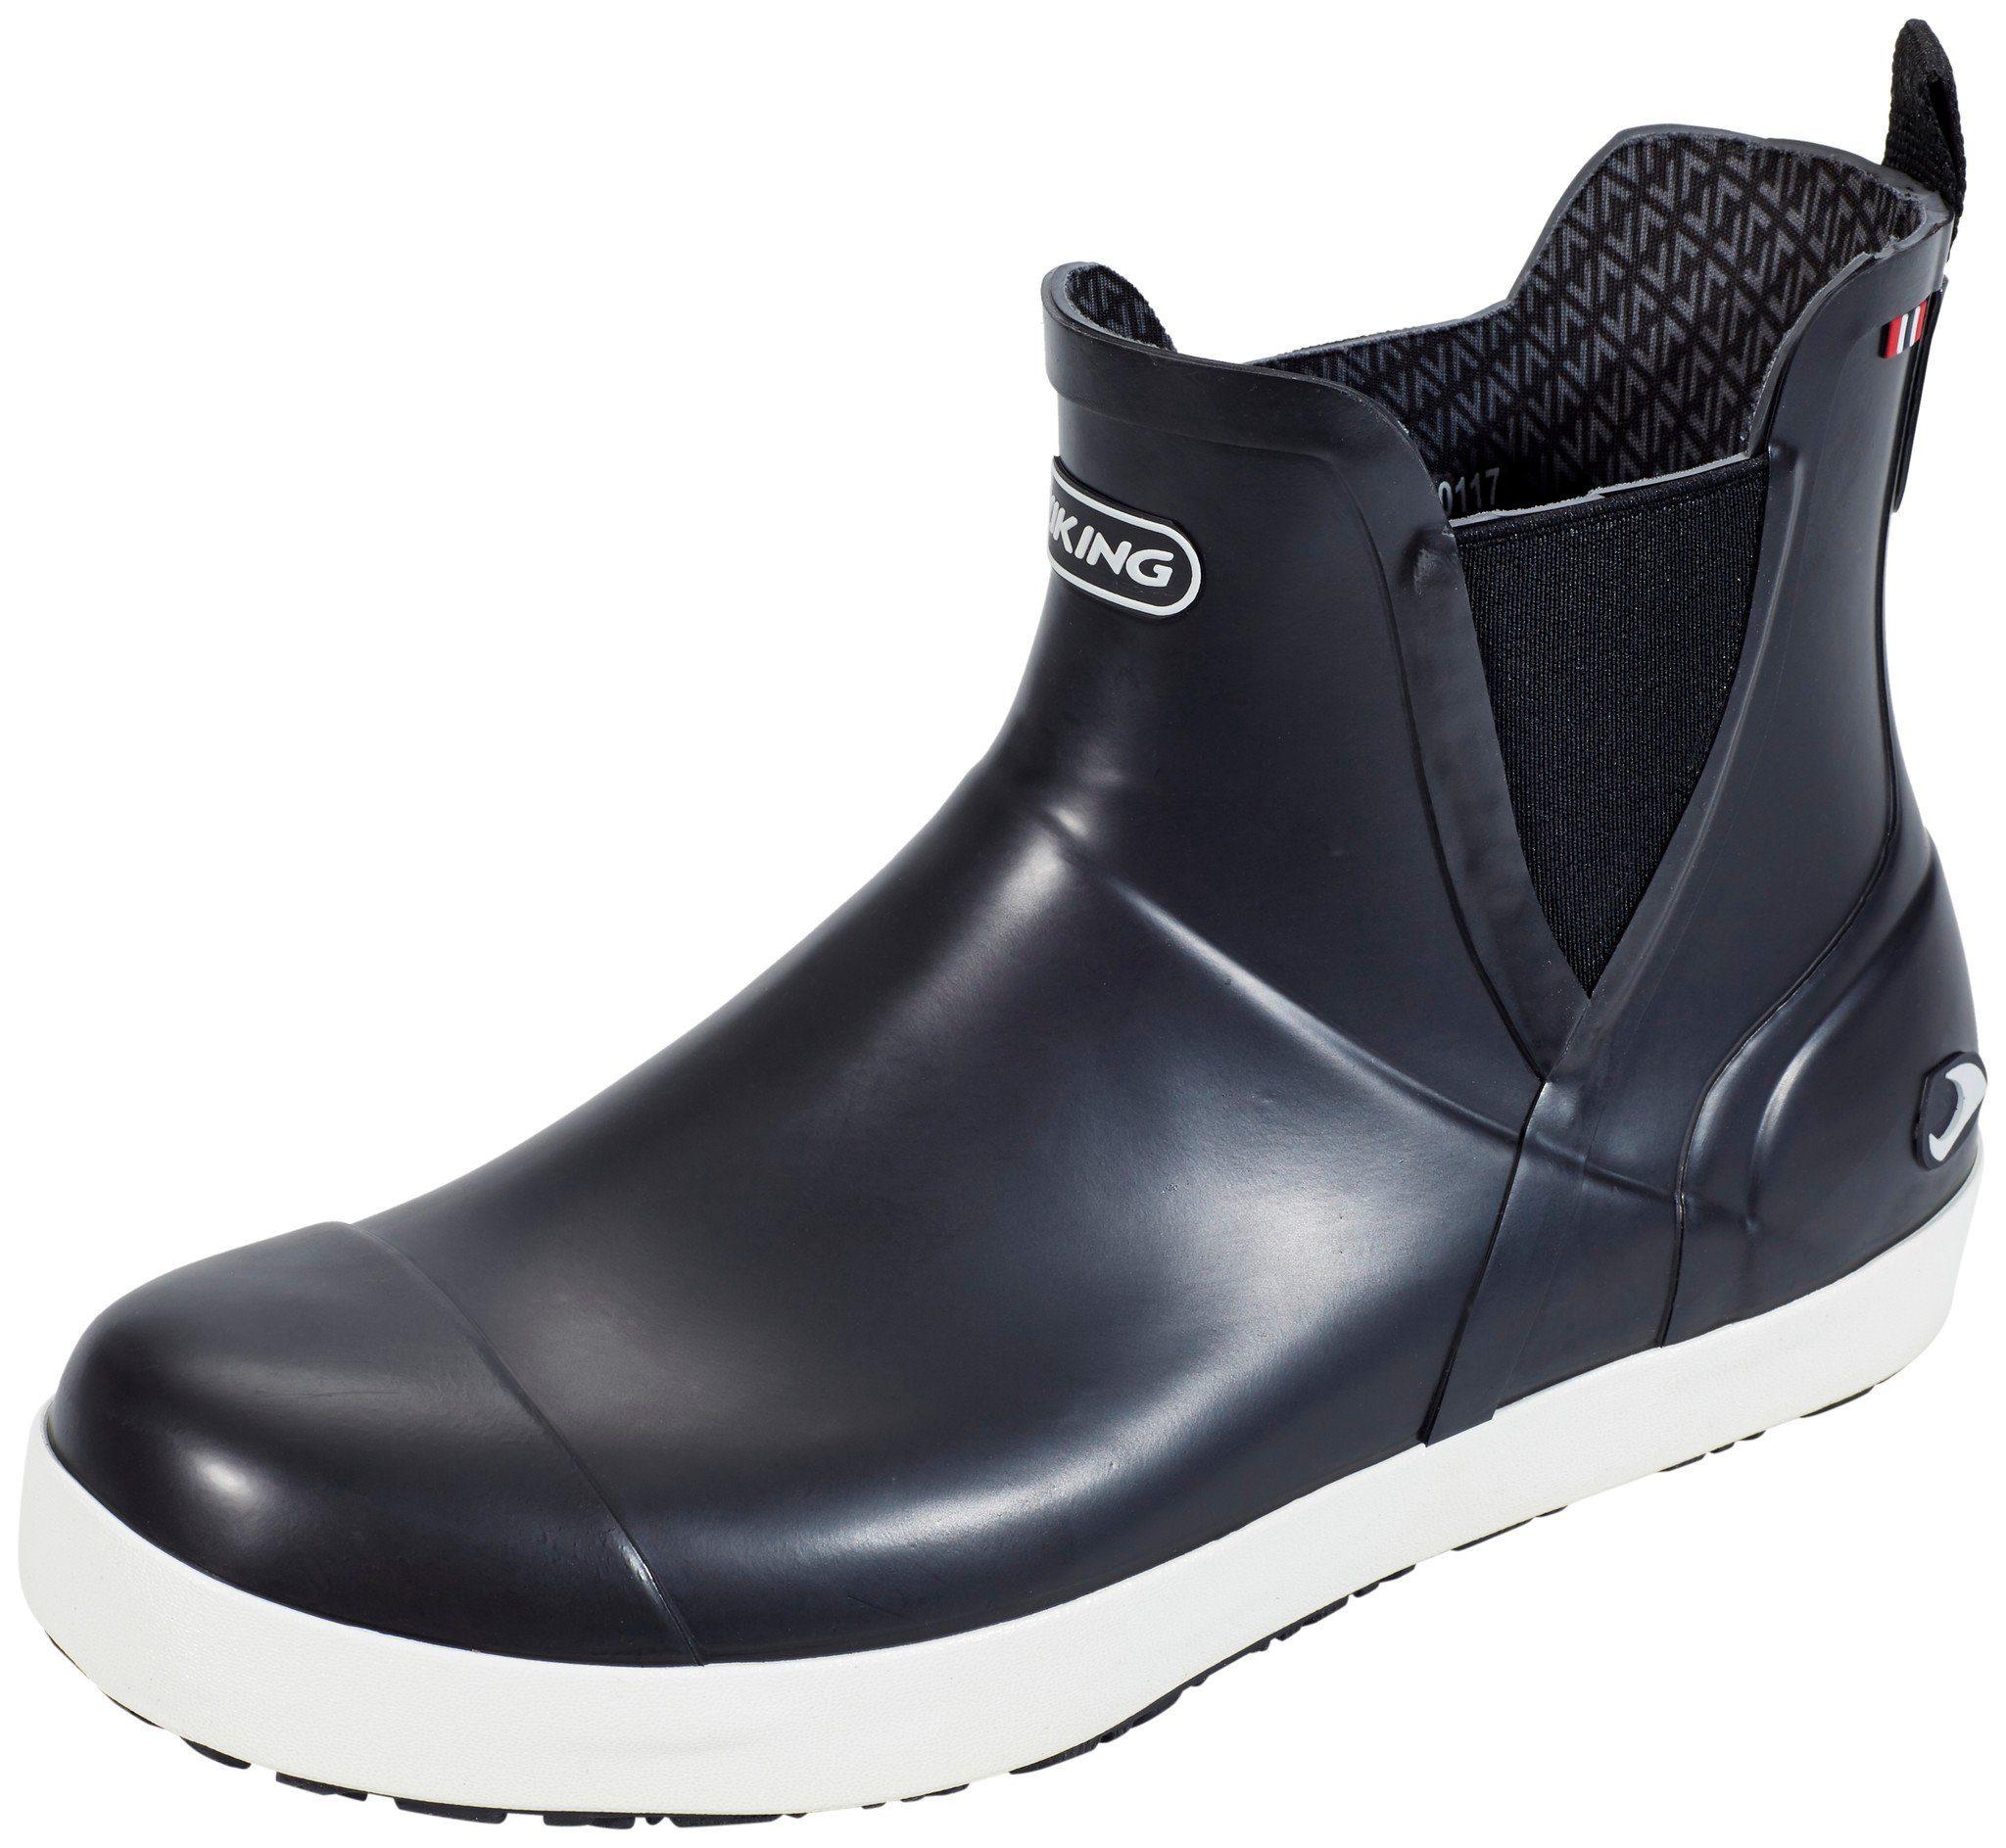 VIKING Trekkingschuh Viking Stavern Shoes Women  schwarz